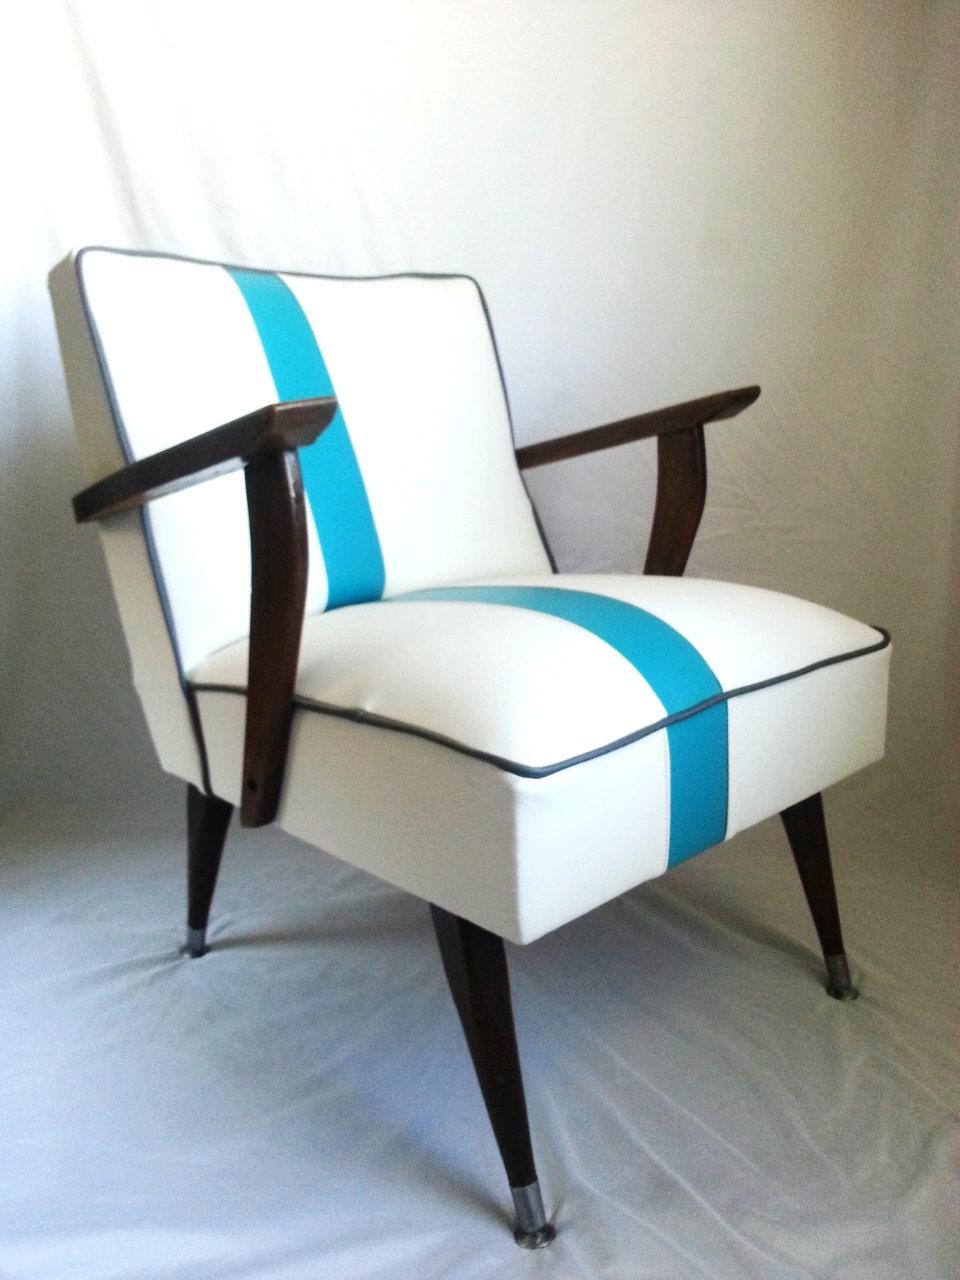 Mid Century Modern Chair White Vinyl With Blue Off Center